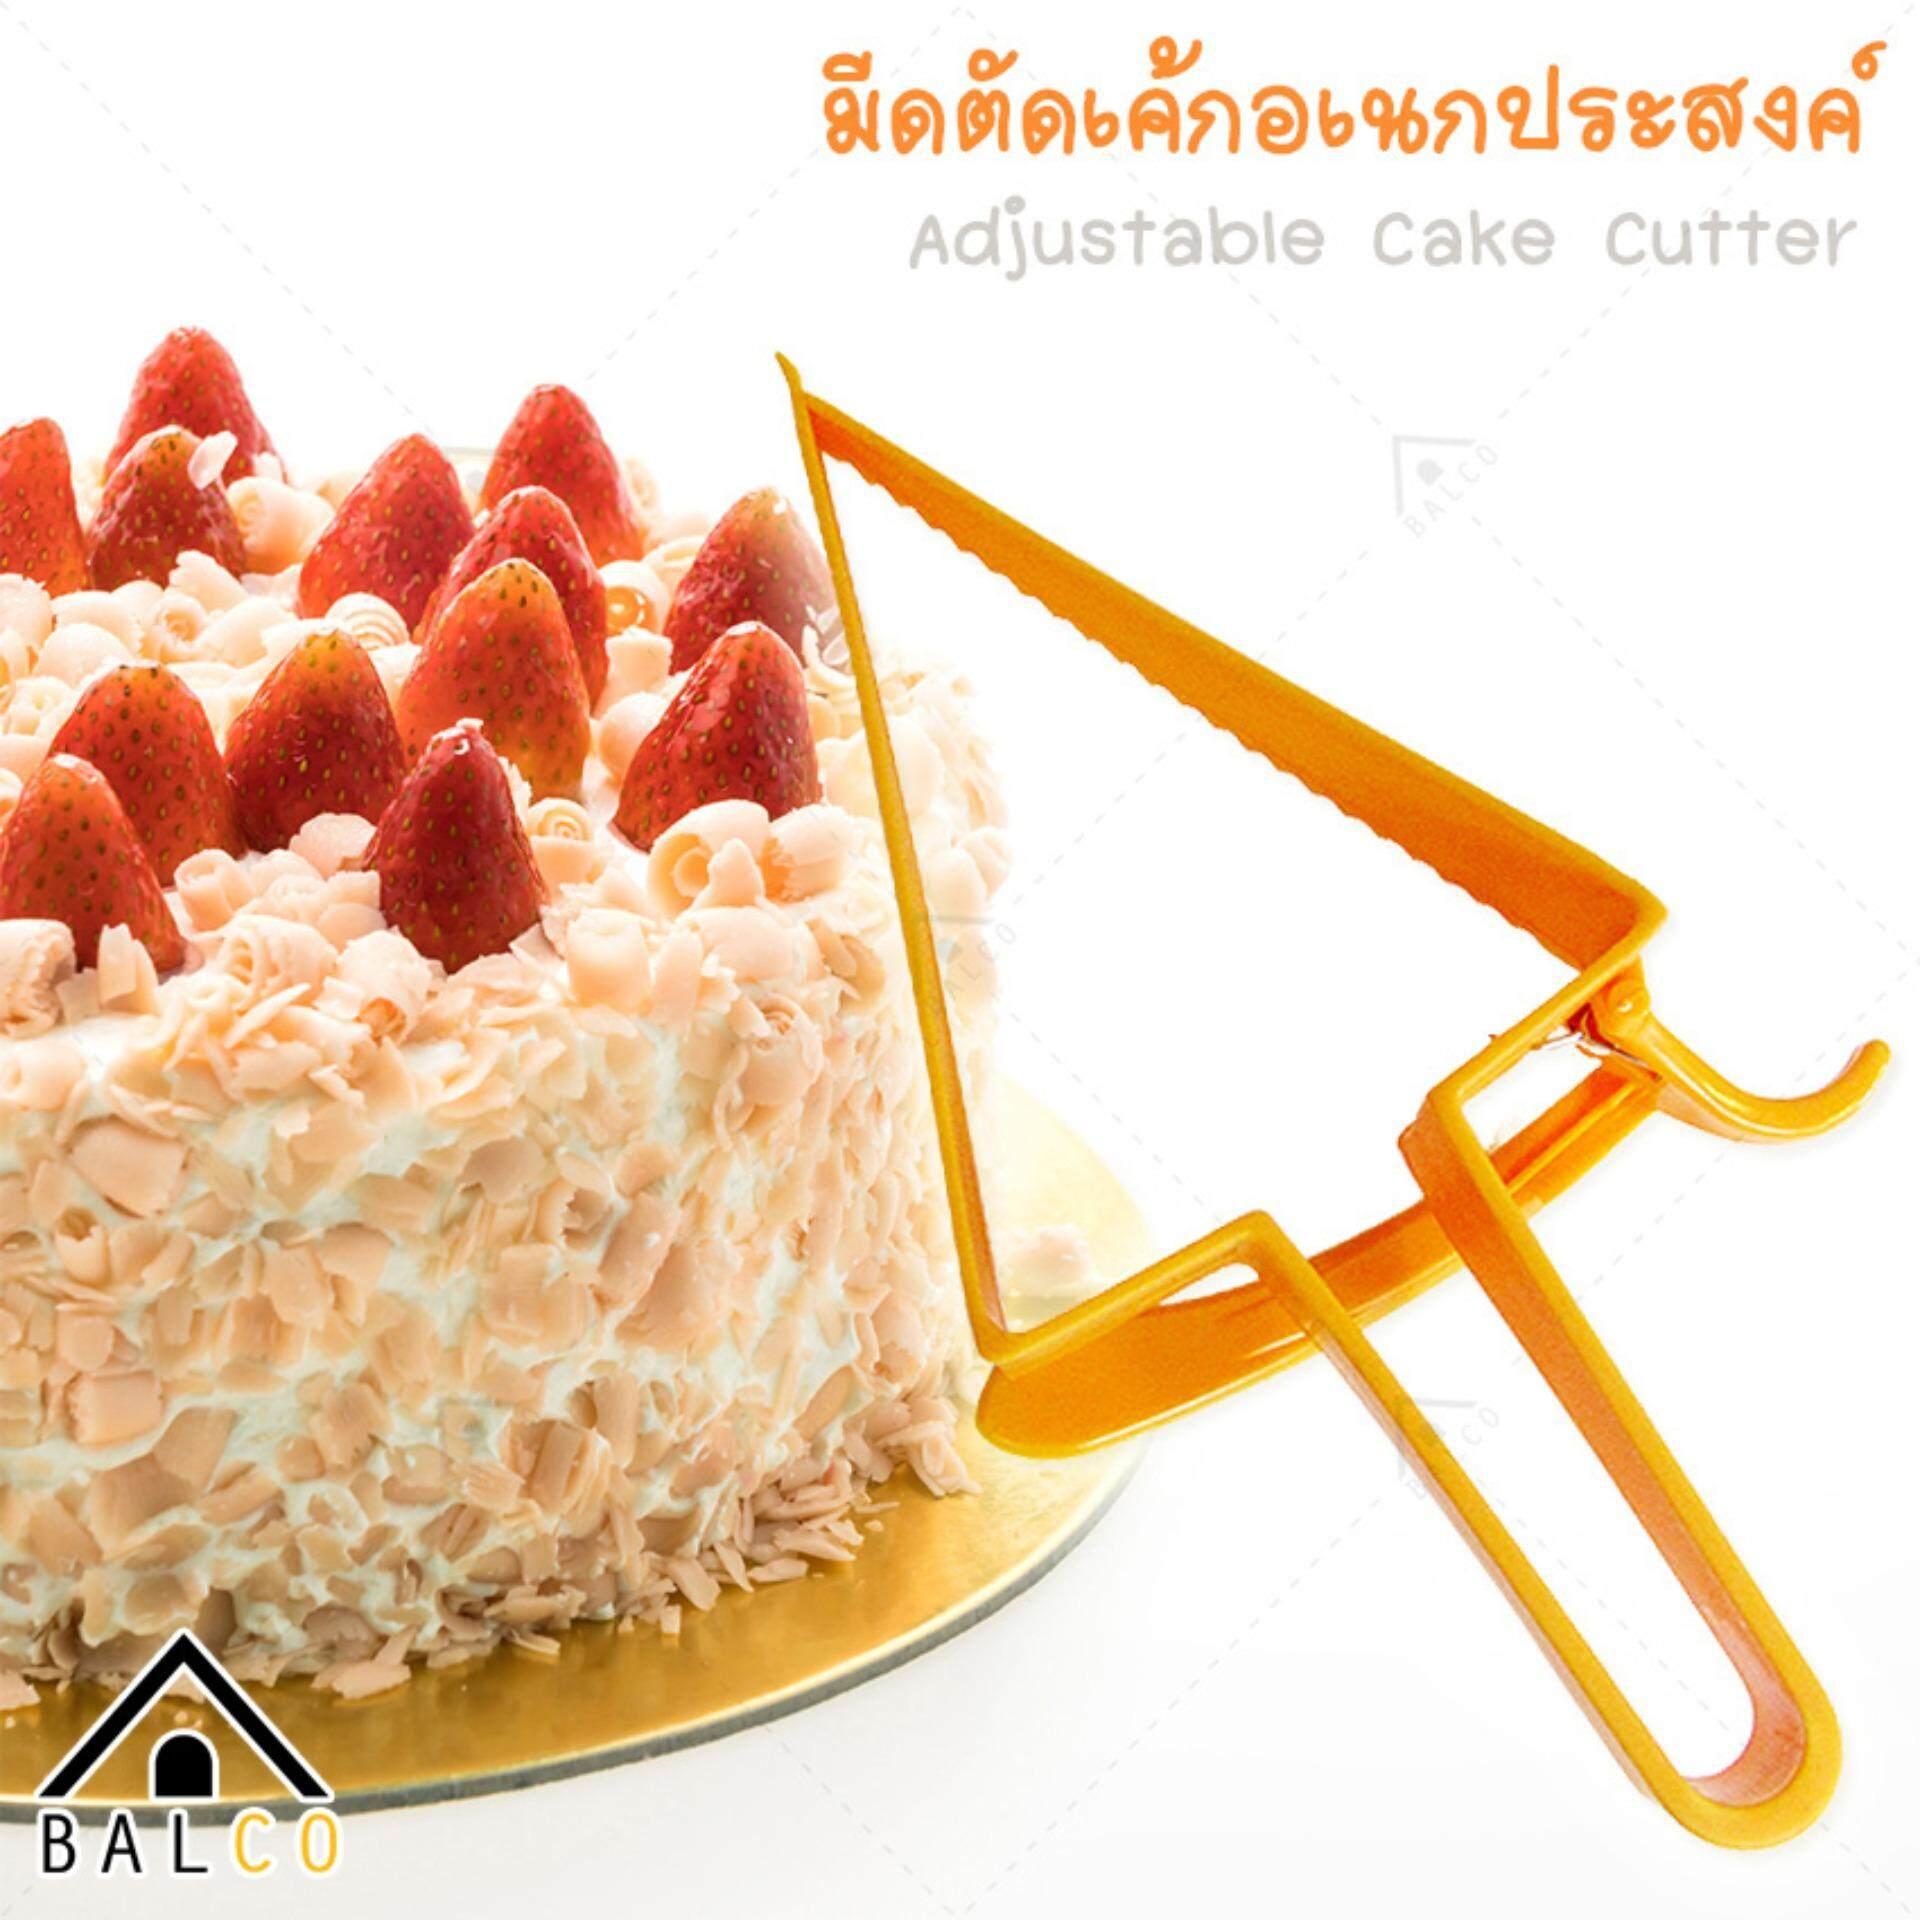 Balco มีดตัด ที่หั่น เค้ก พิซซ่า Cake Cutter Slicer ใช้งานง่าย ปรับขนาดได้ ตัดได้ทั้งชิ้นเล็กและชิ้นใหญ่ รุ่น KDH-0003